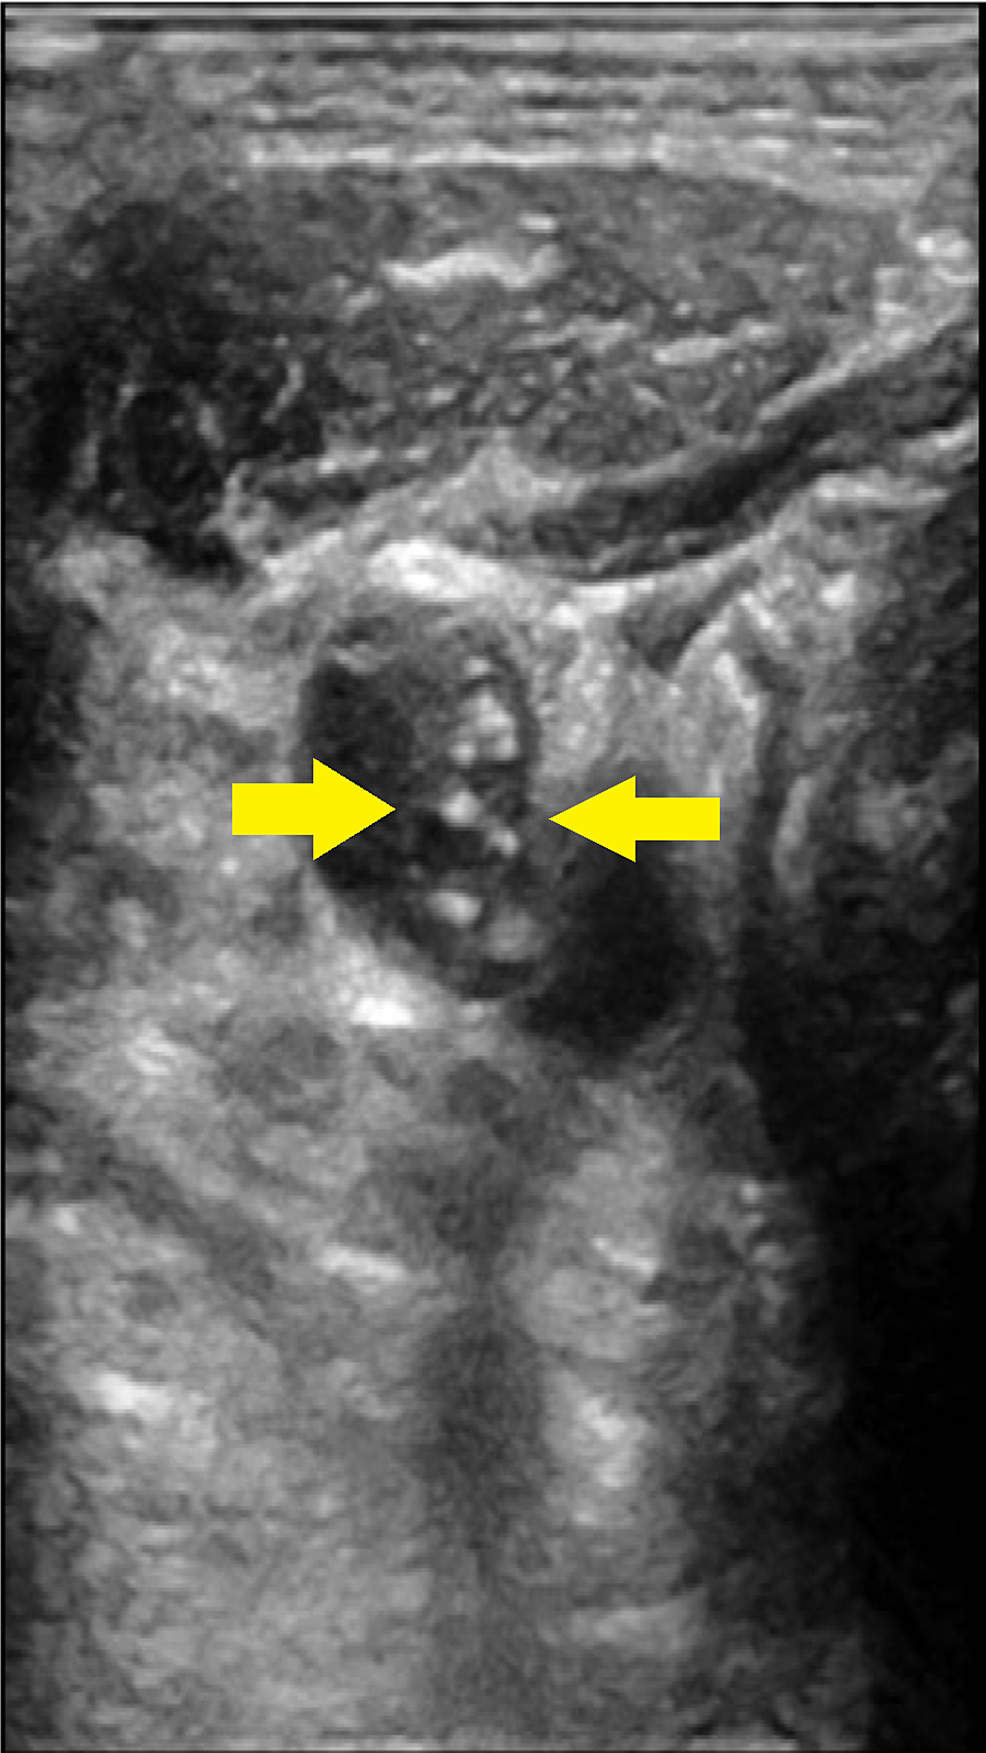 Right-internal-jugular-vein-(IJV)-thrombus